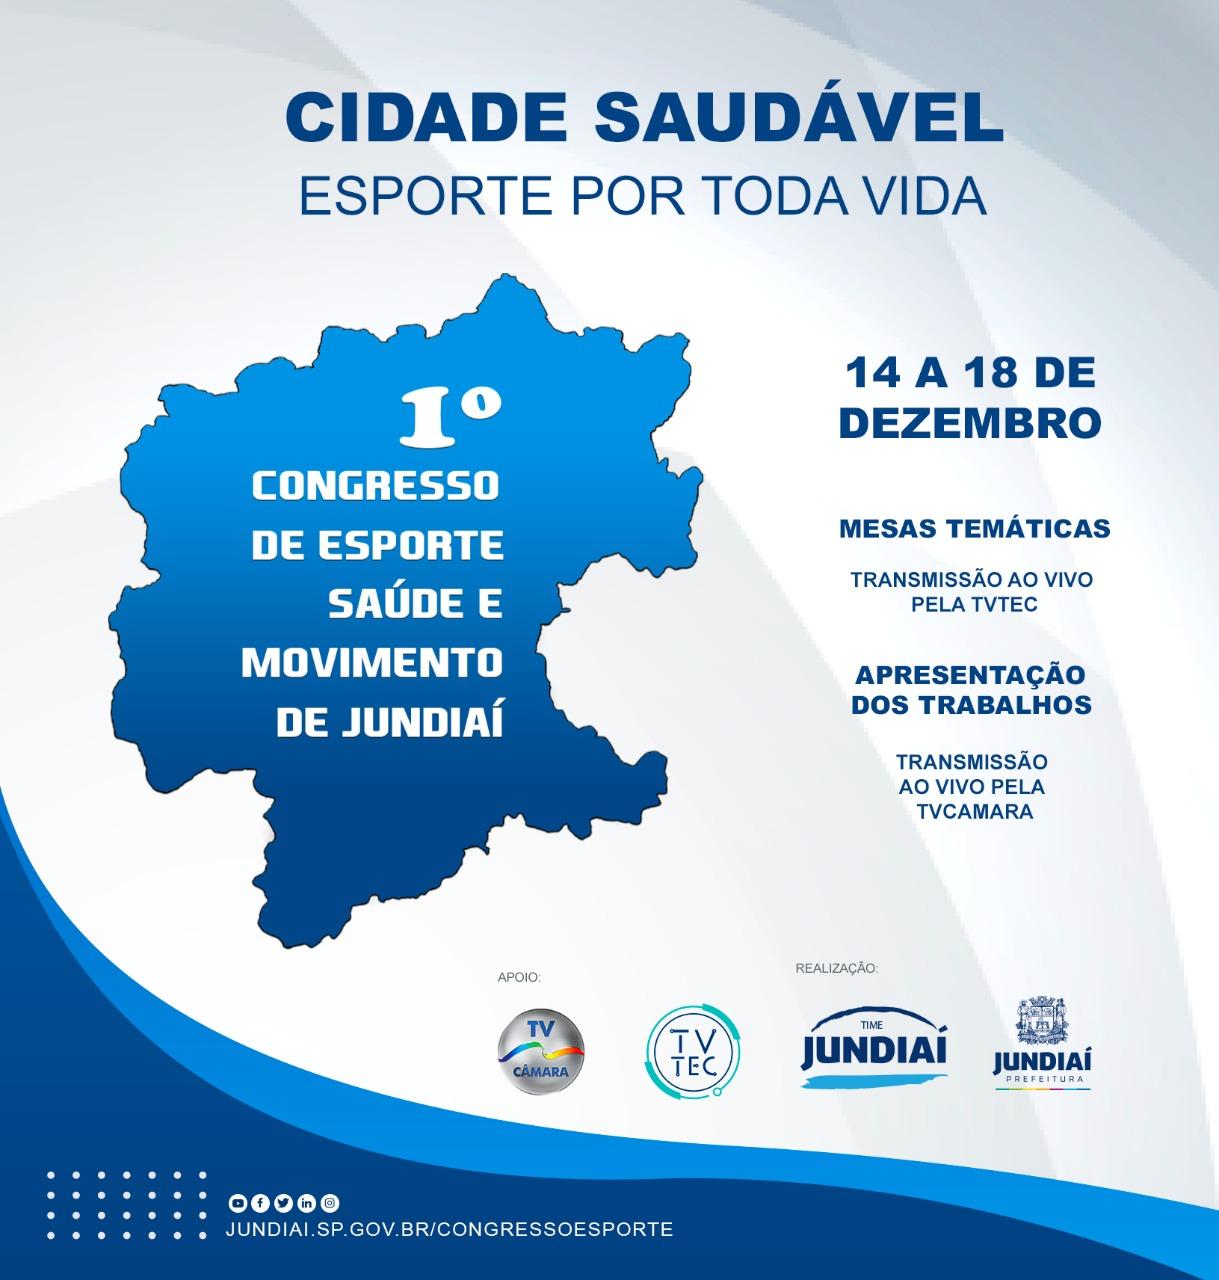 Congresso acontece de 14 a 18 de dezembro de forma virtual